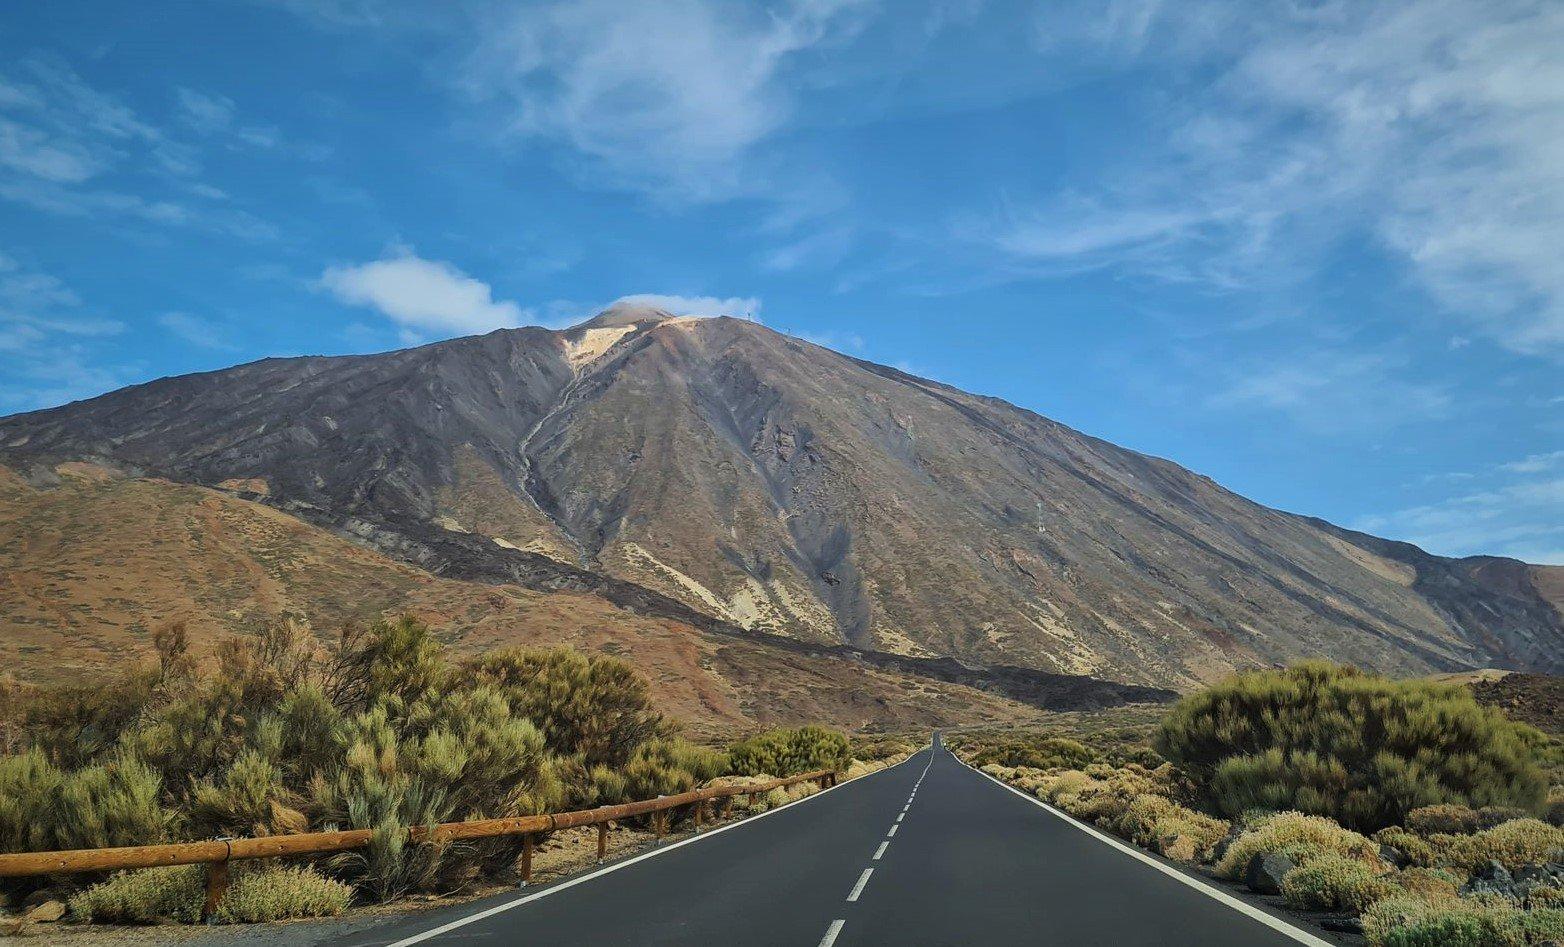 Tenerife on the road Itinerario intorno al Teide